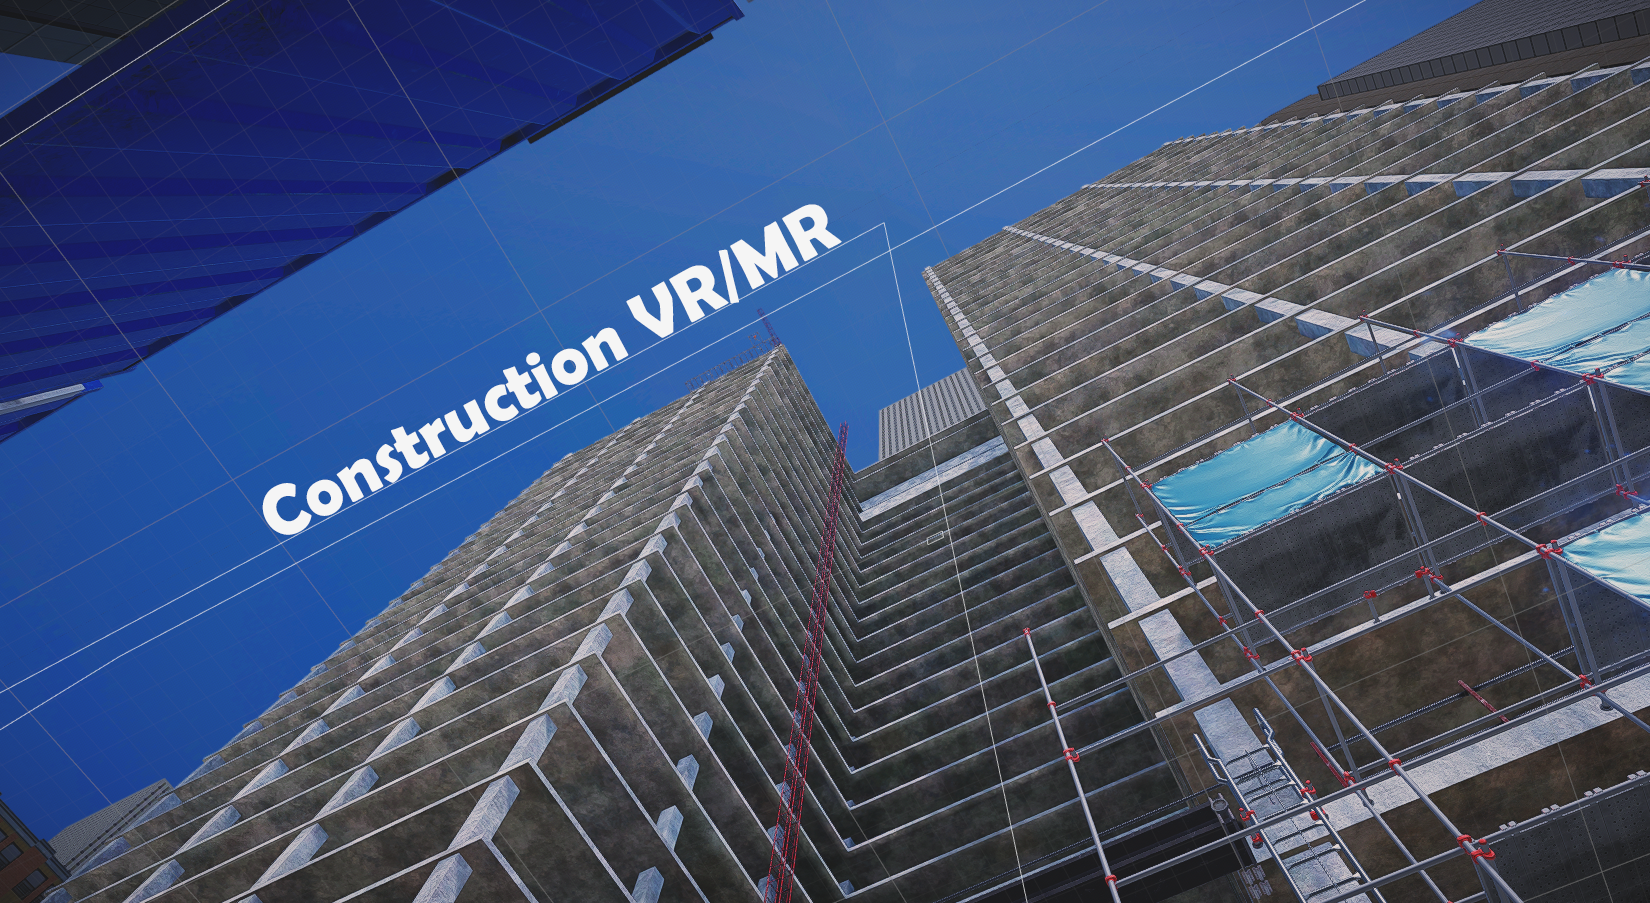 Construction VR/MR